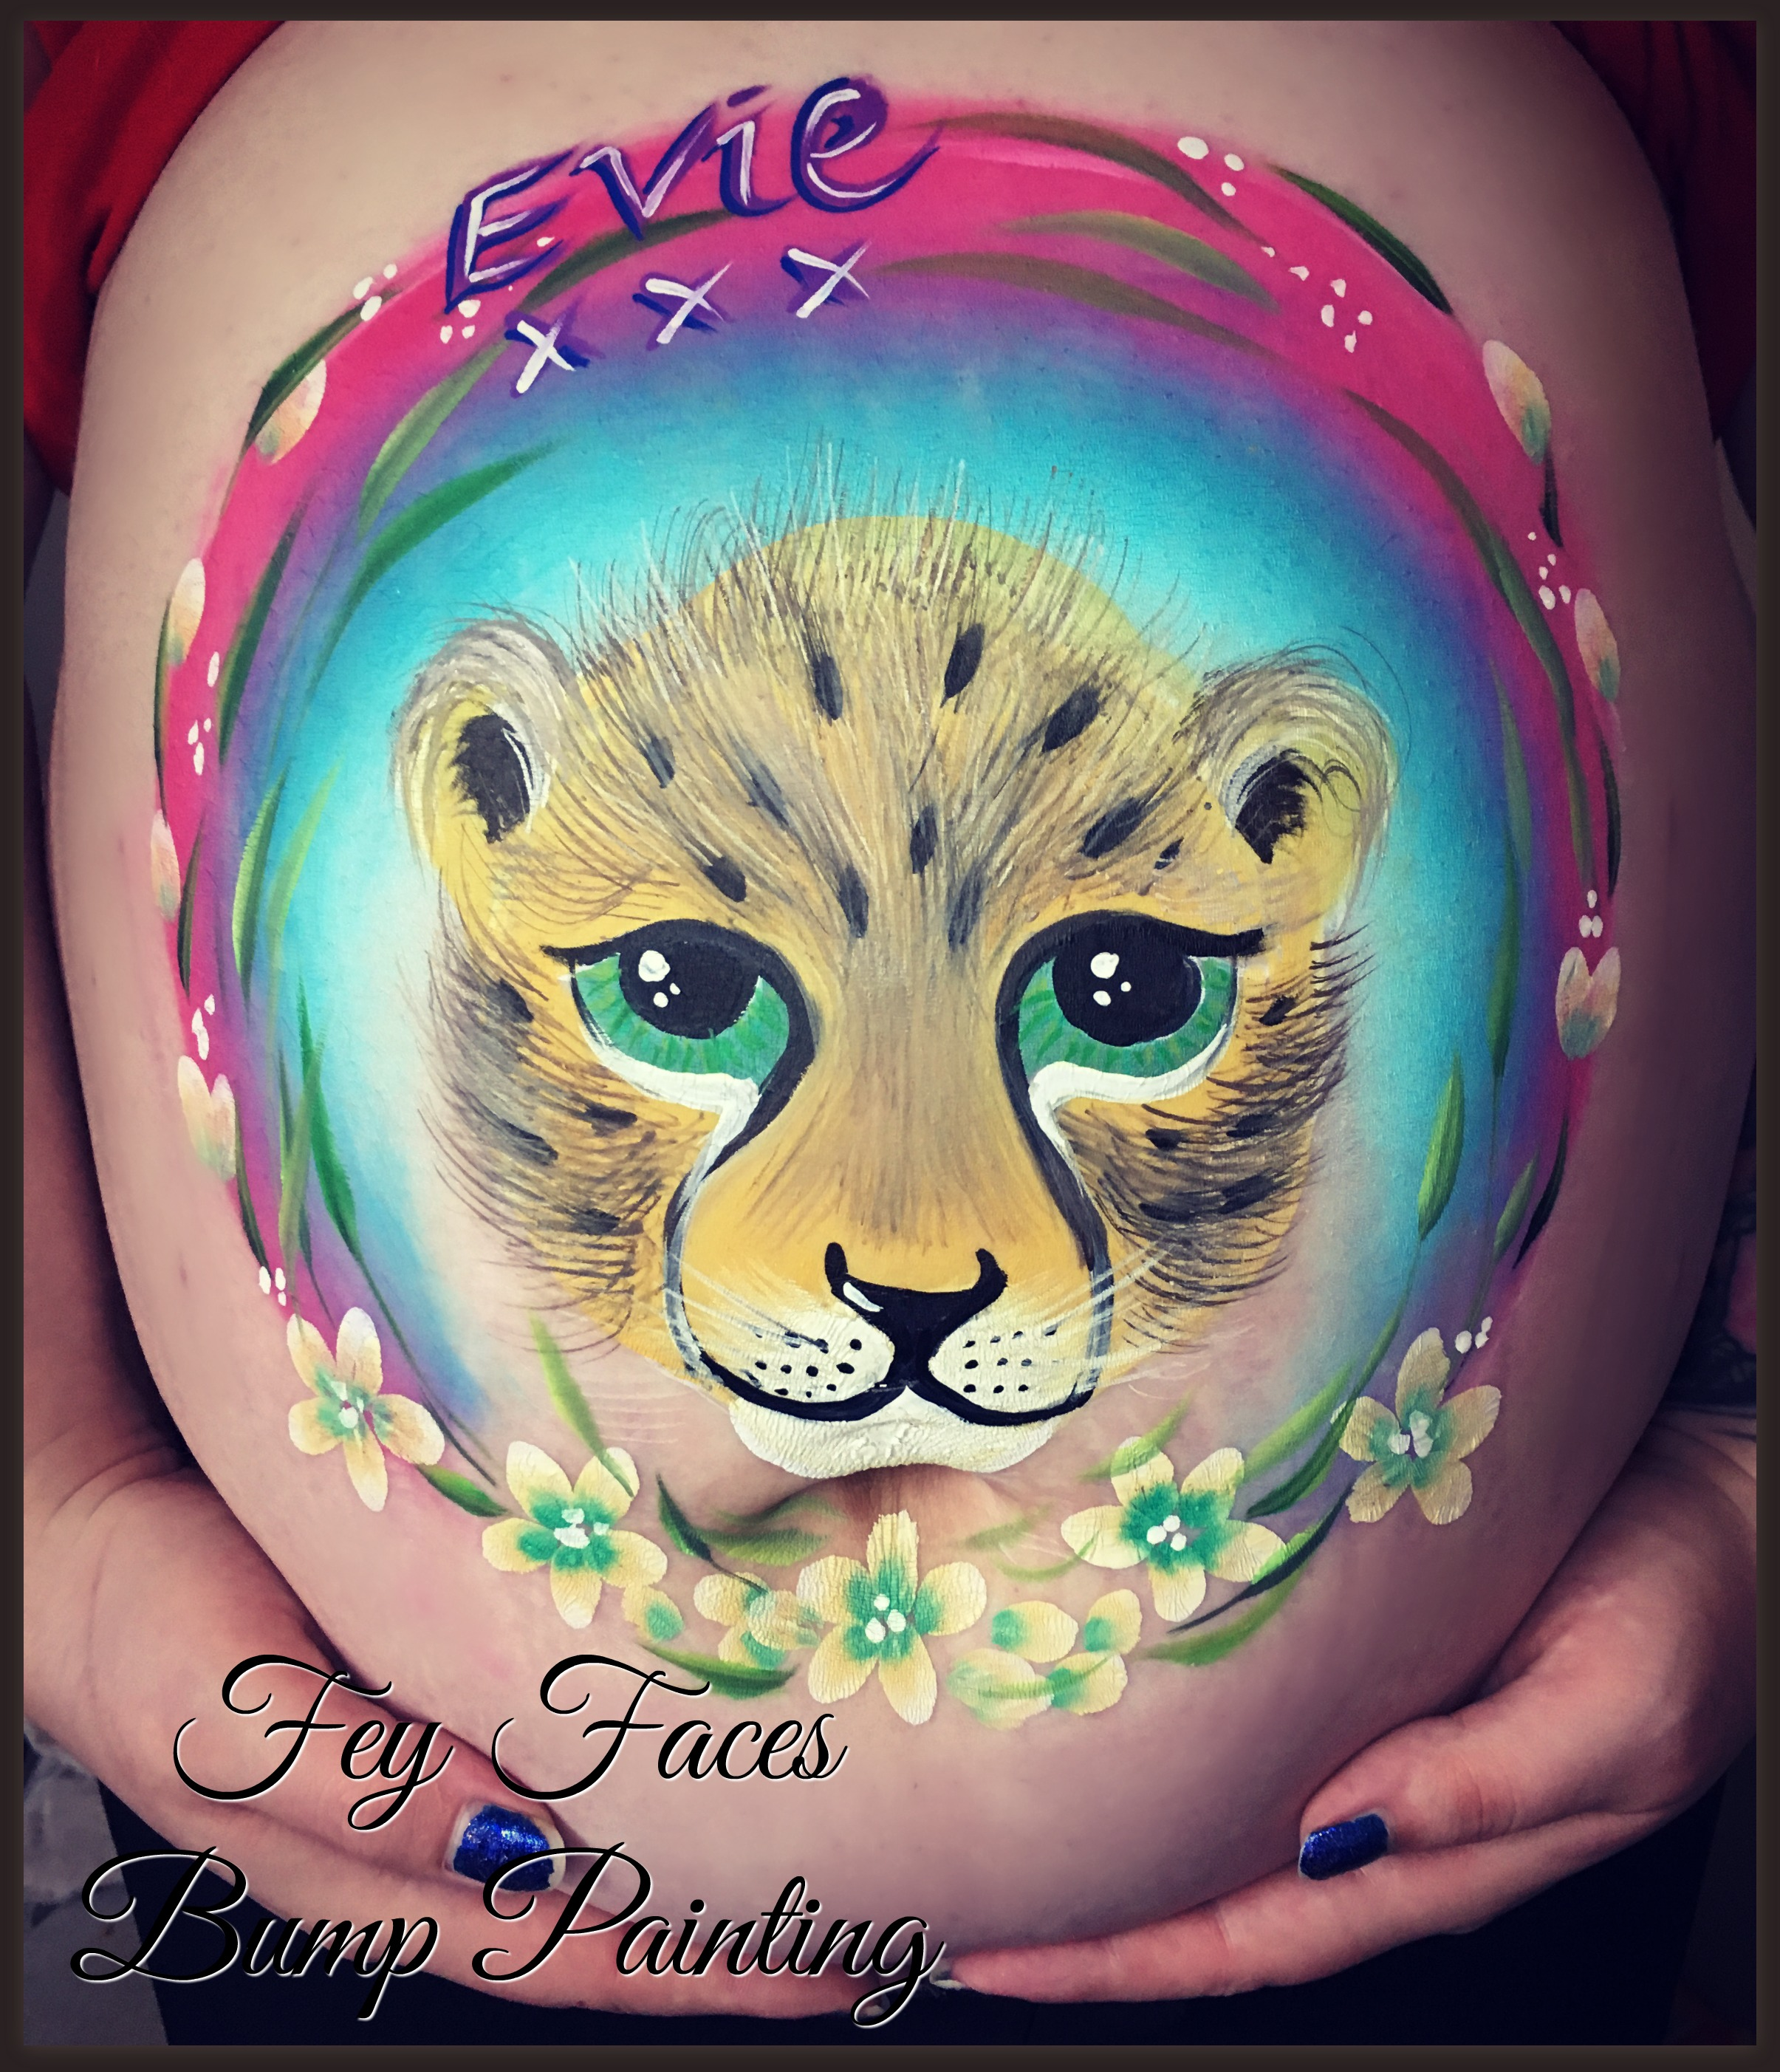 Leopard cub bump painting